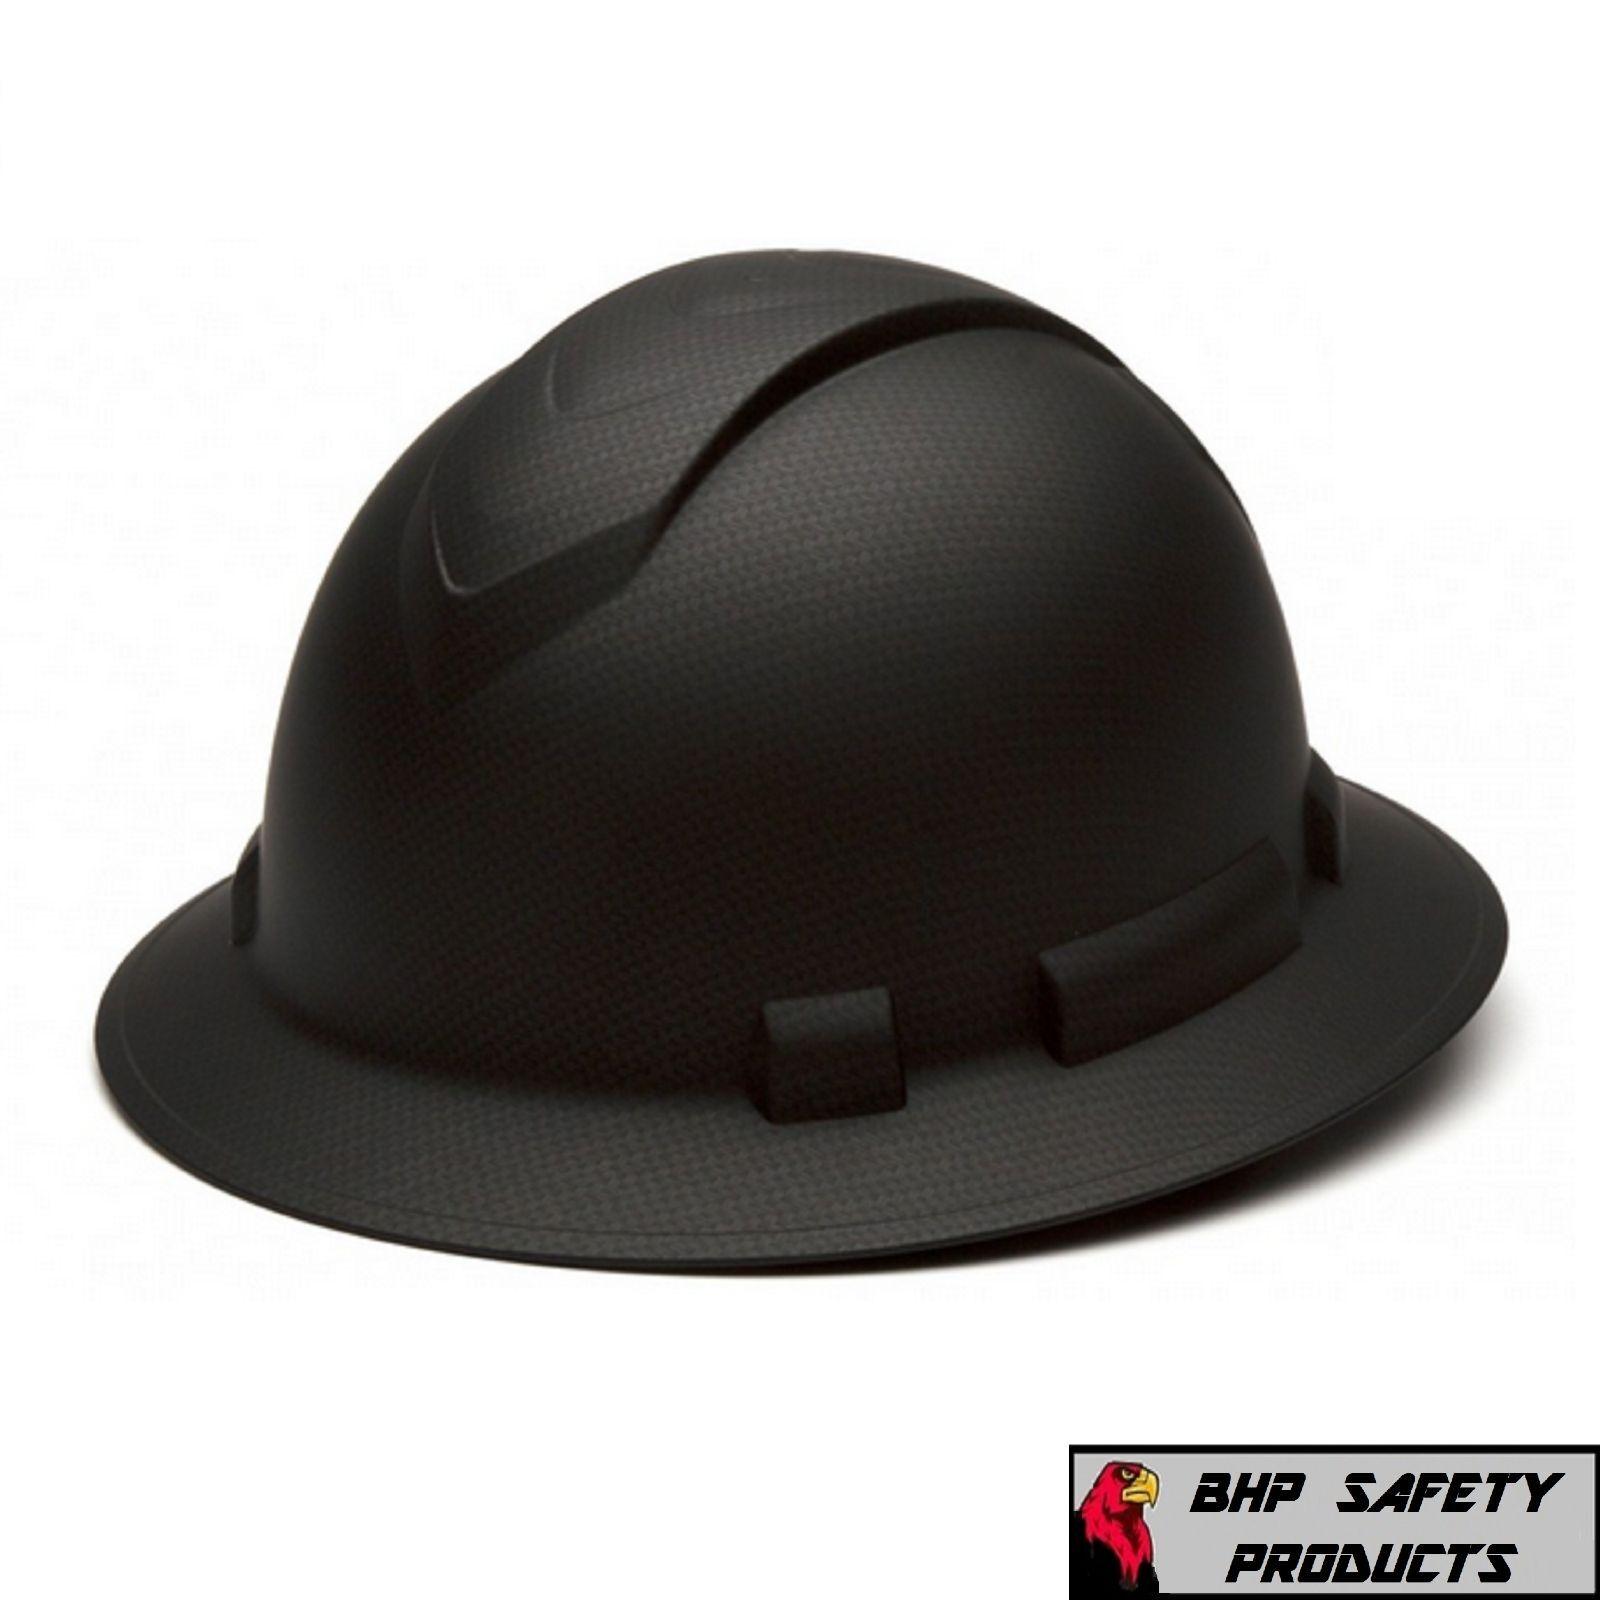 Pyramex Ridgeline Full Brim Graphite Pattern Hard Hat Black